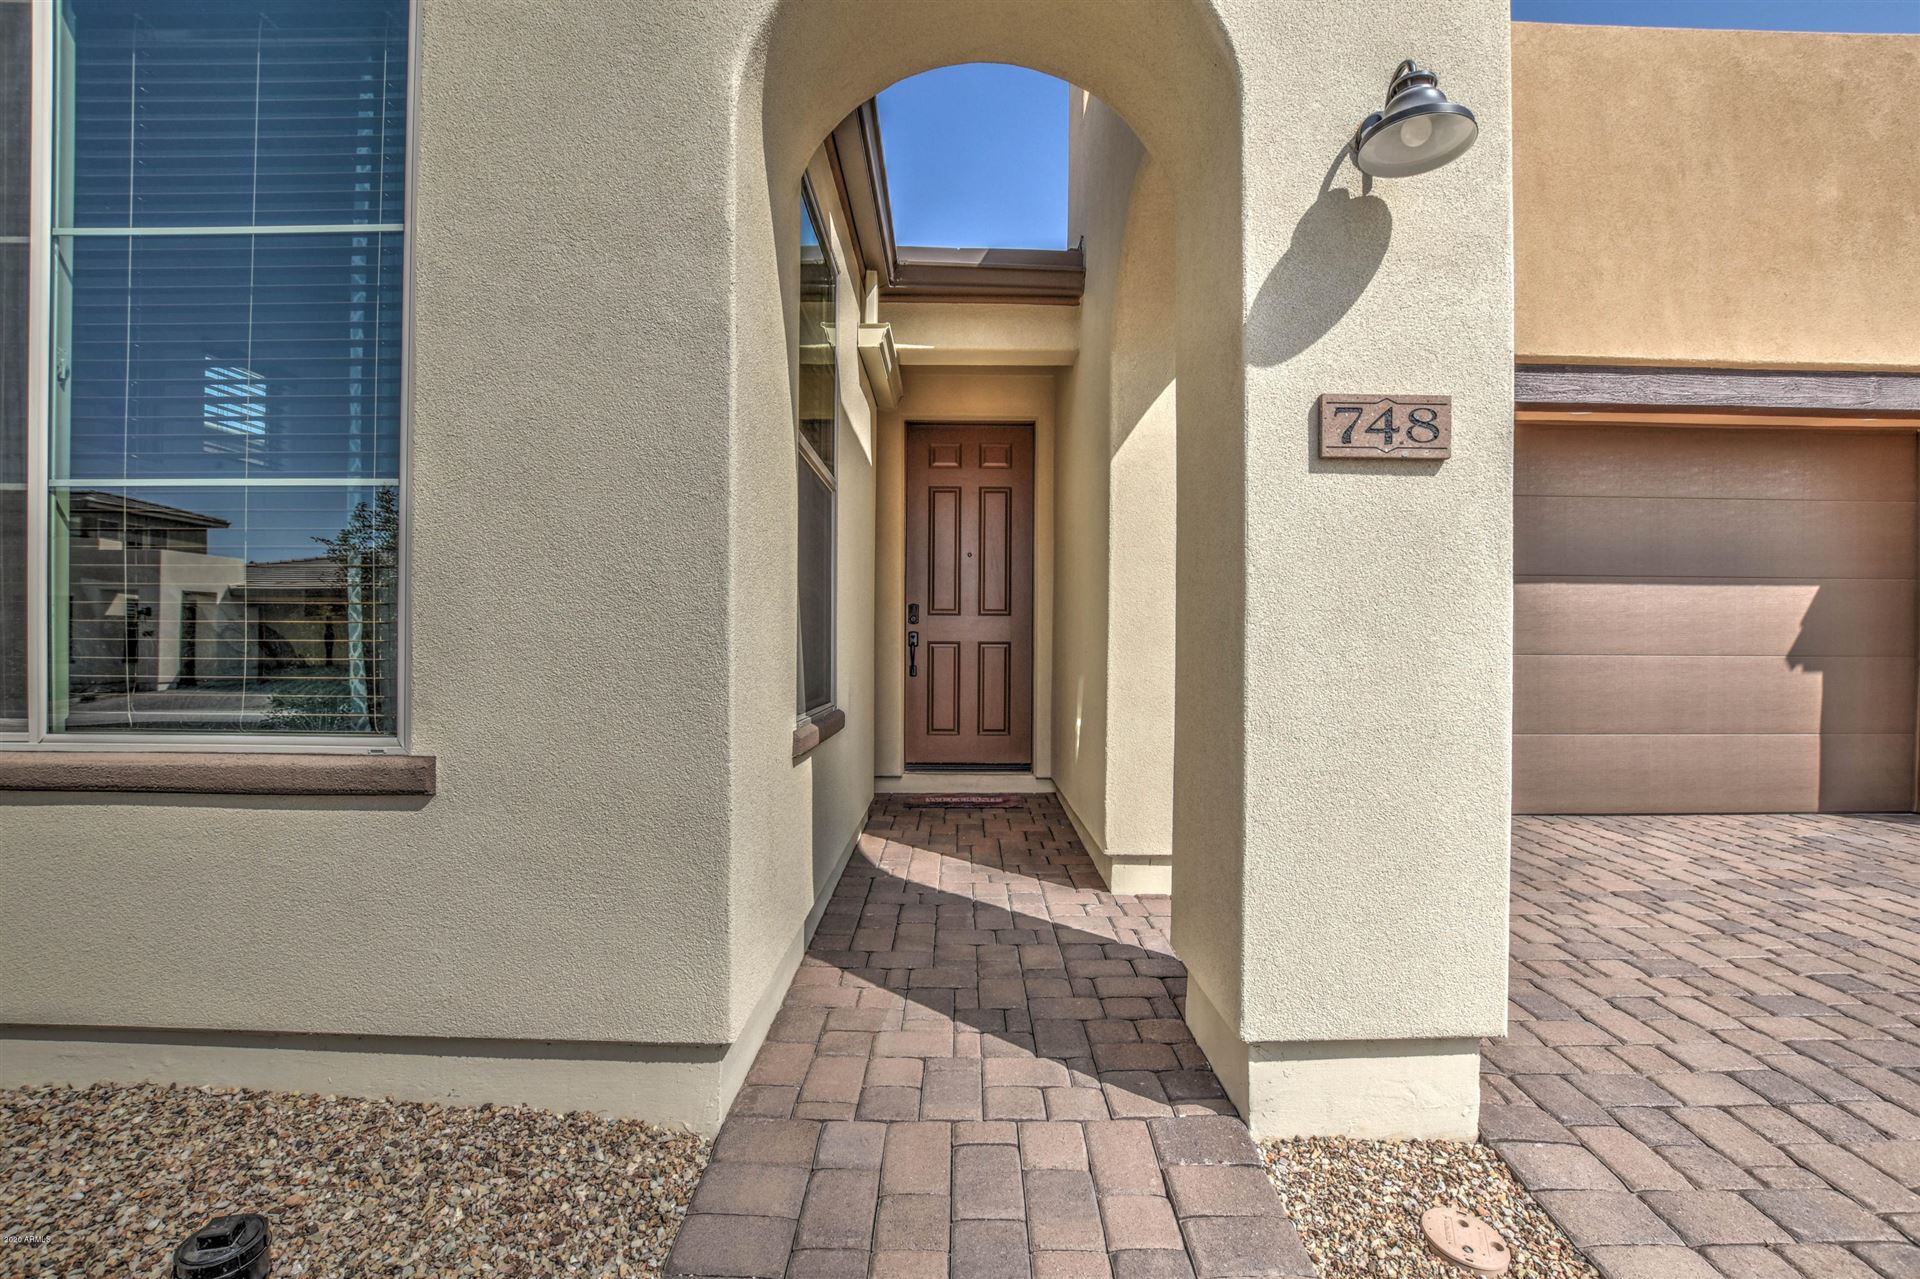 748 E MYRTLE PASS --, San Tan Valley, AZ 85140 - MLS#: 6129615